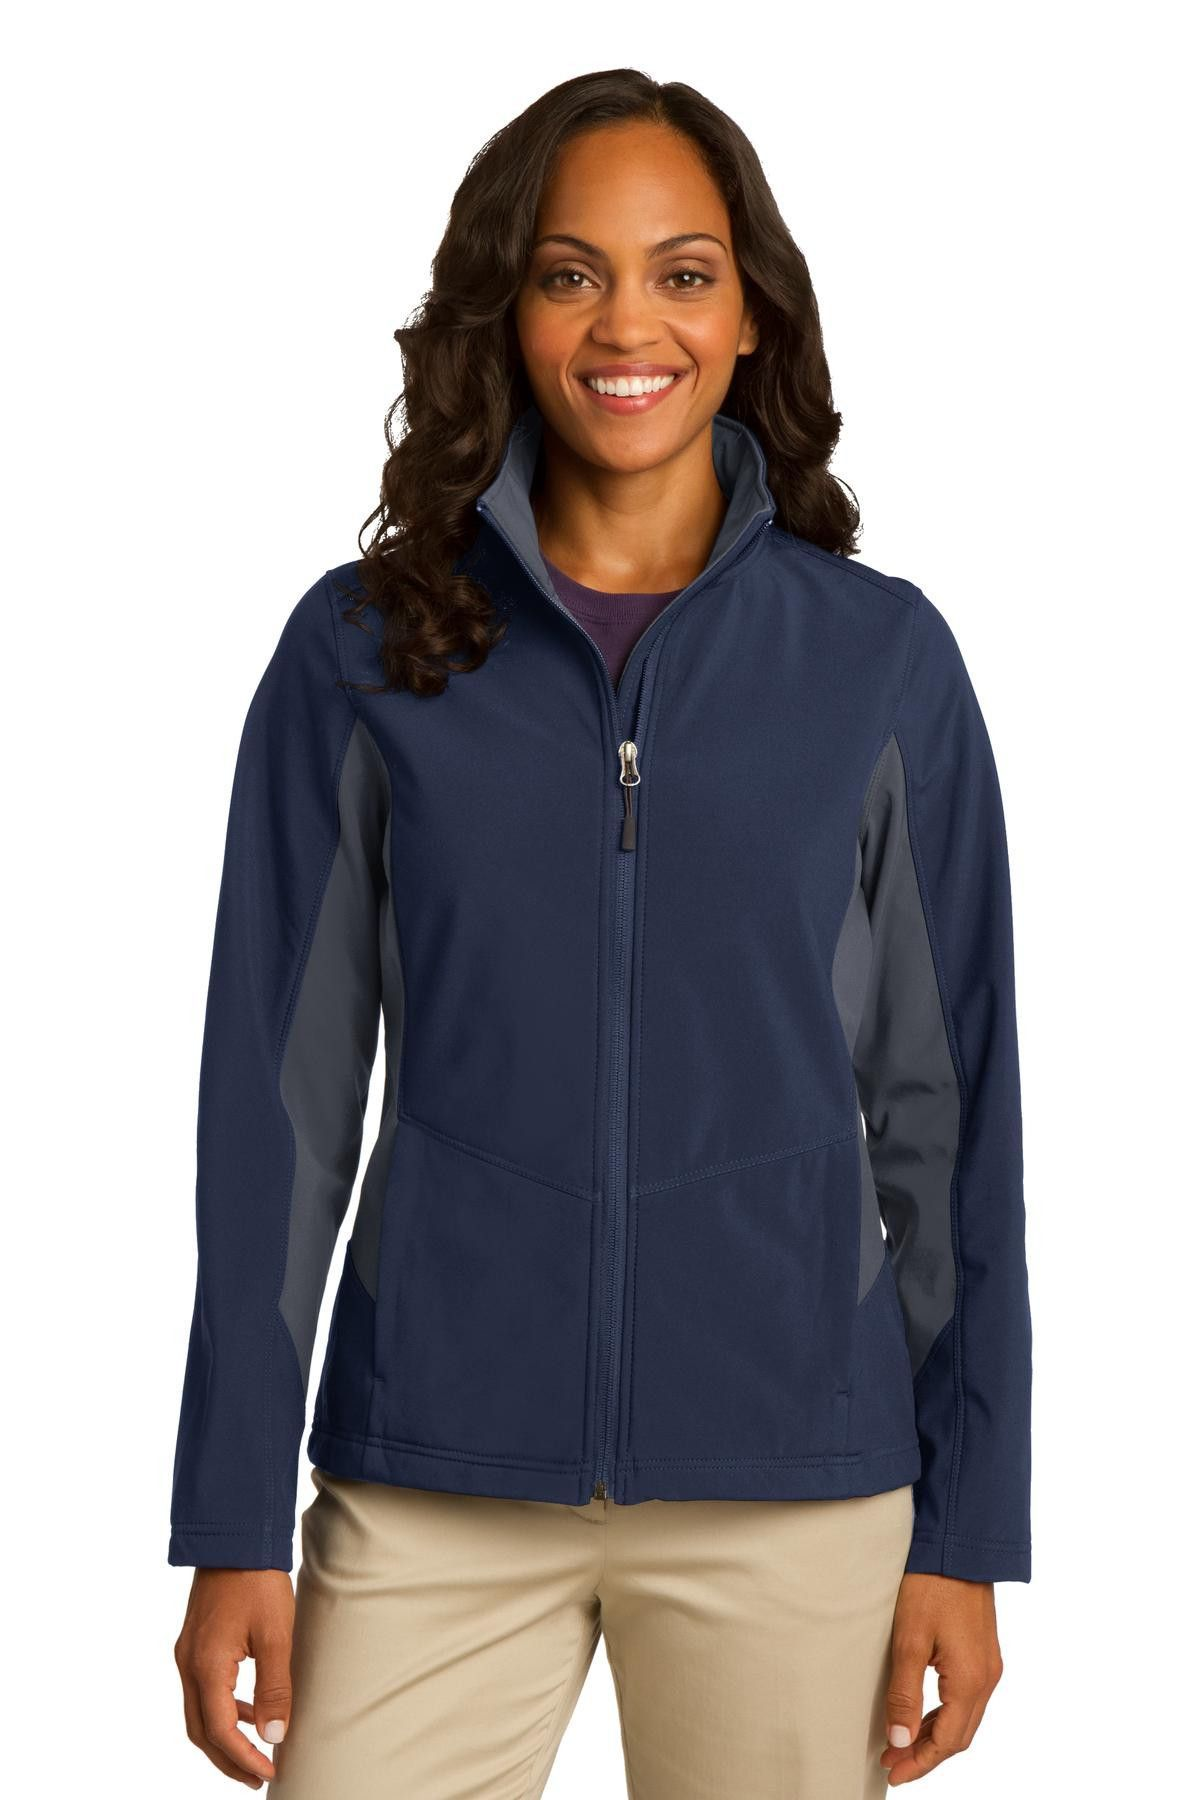 Port Authority Ladies Core Colorblock Soft Shell Jacket L318 Dress ...